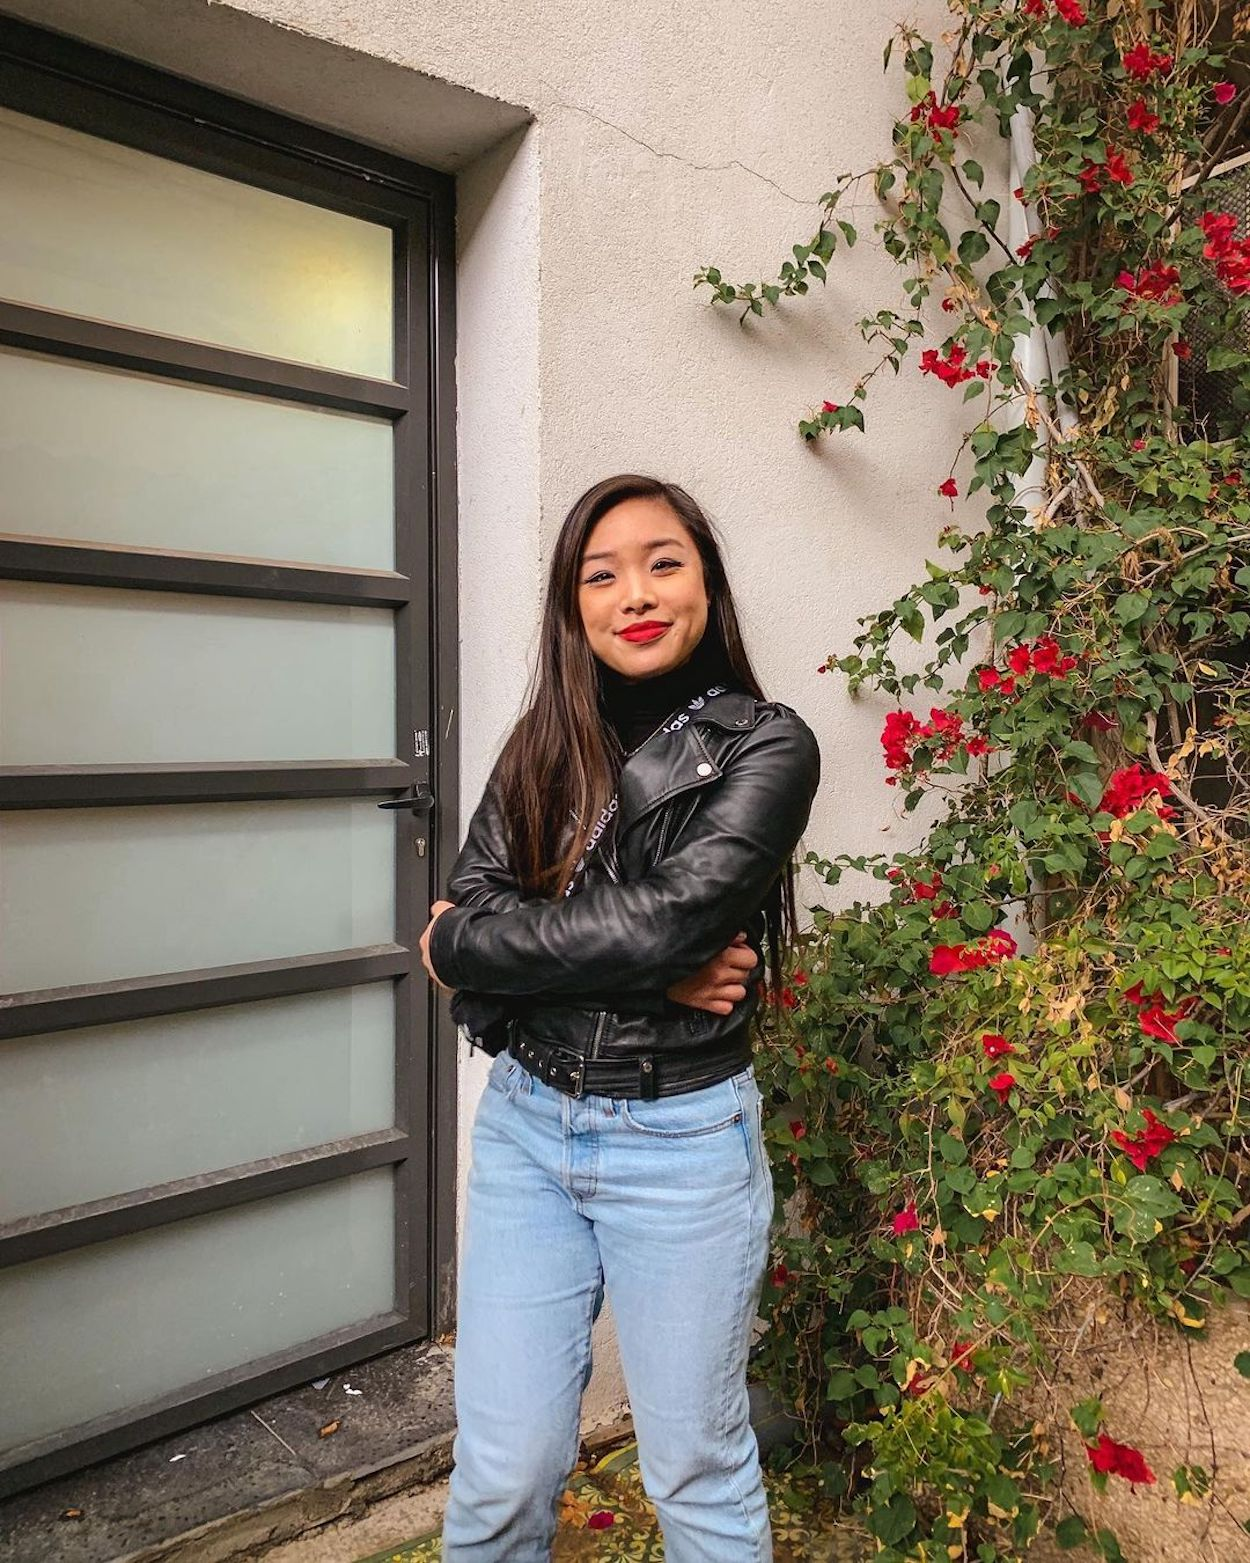 Fall outfit - M Boutique black turtleneck, Rudsak leather jacket, Levi's wedgie jeans